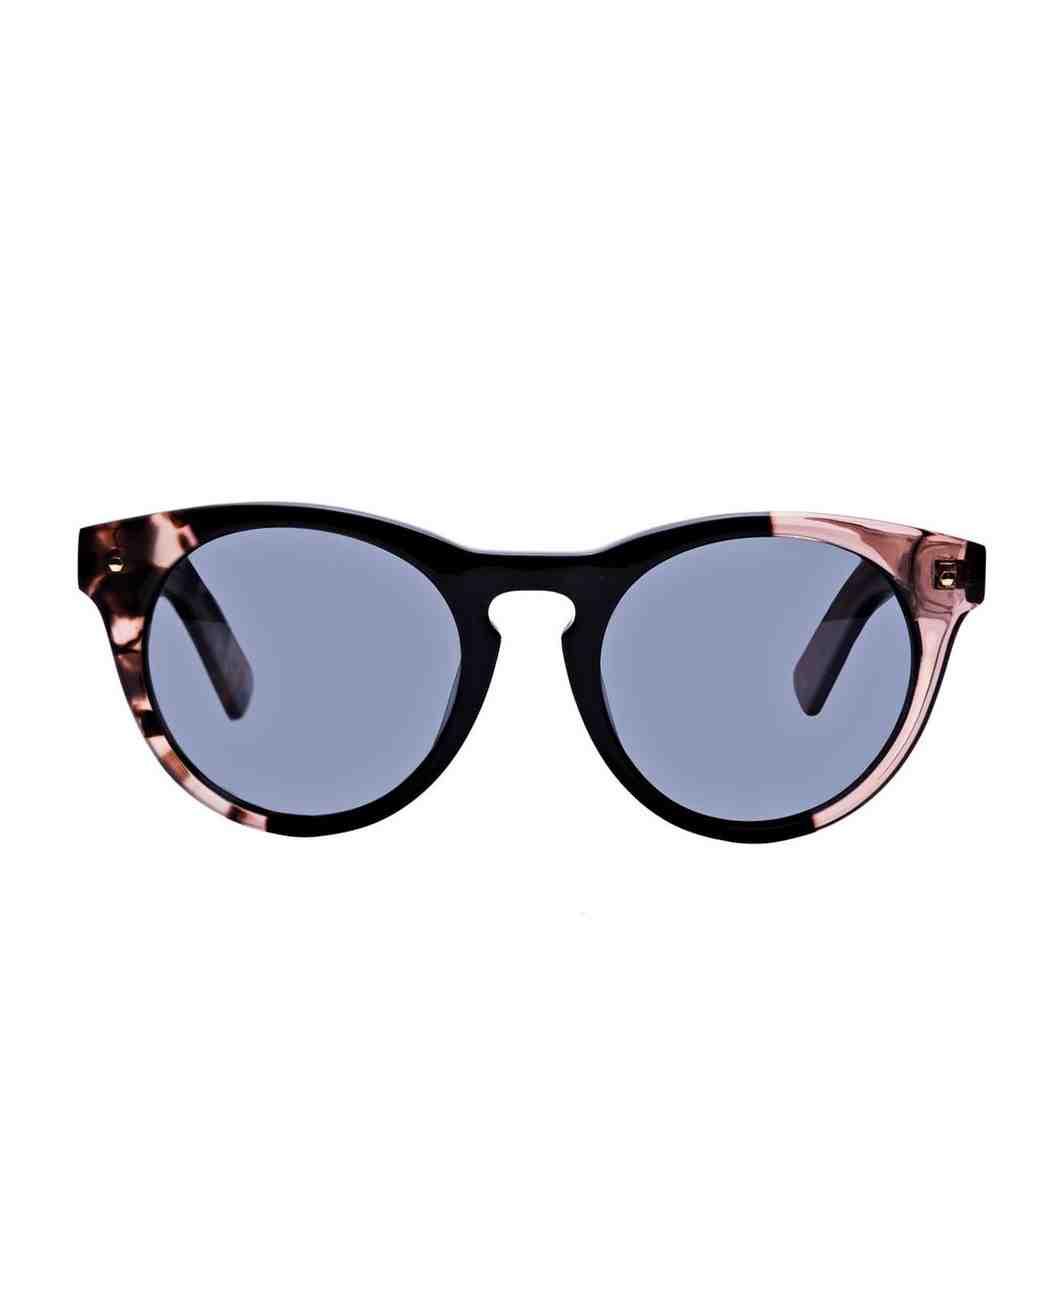 valentines-day-gifts-for-her-bonlook-nola-rose-black-sunglasses-0216.jpg